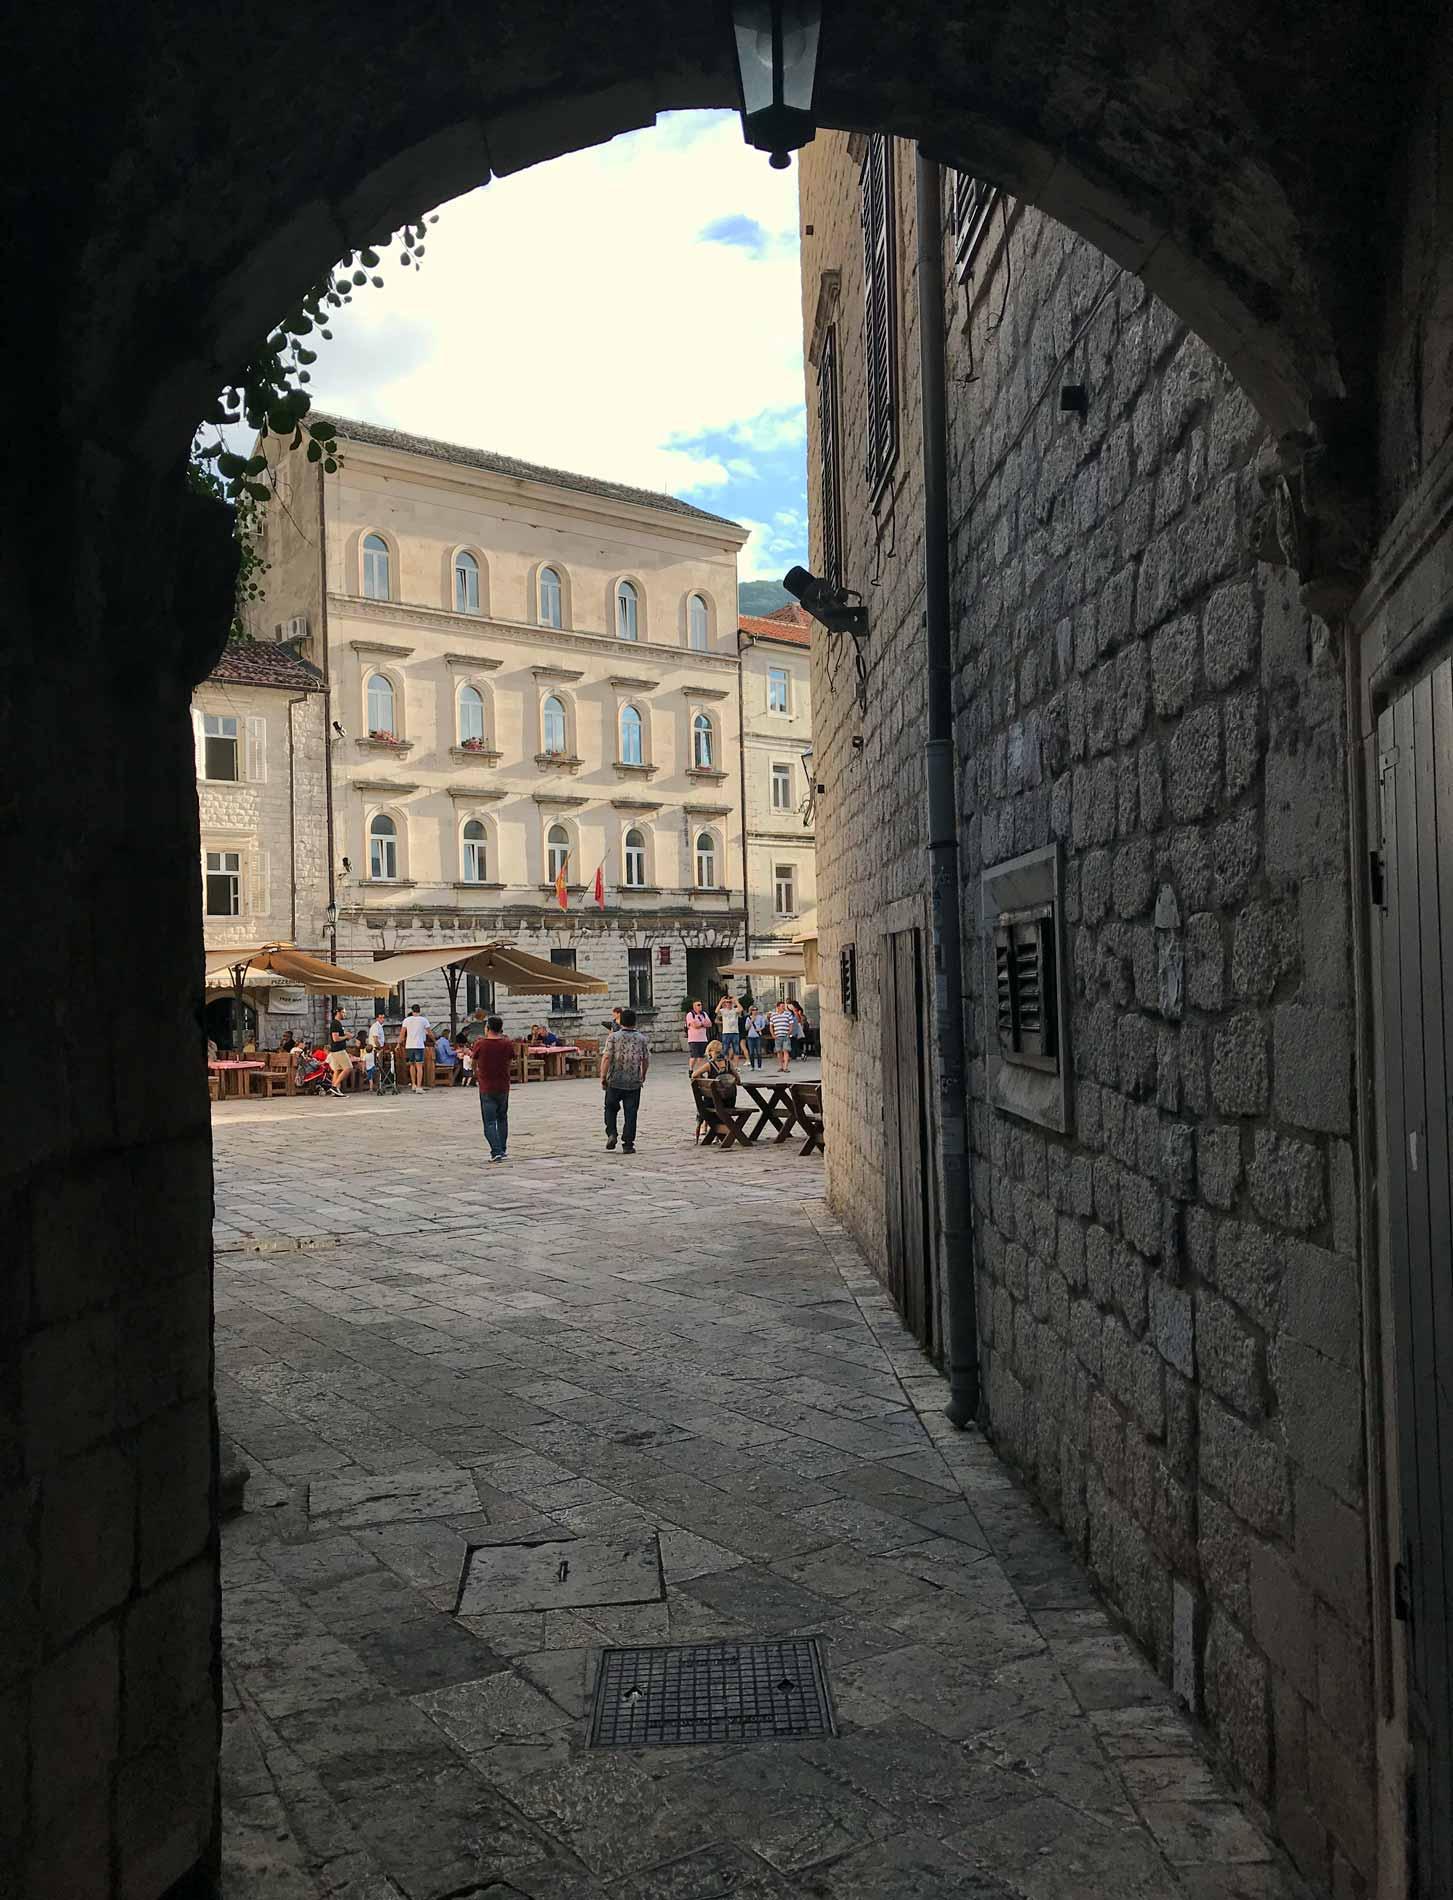 Kotor-Montenegro-centro-storico-scorcio-palazzo-persone